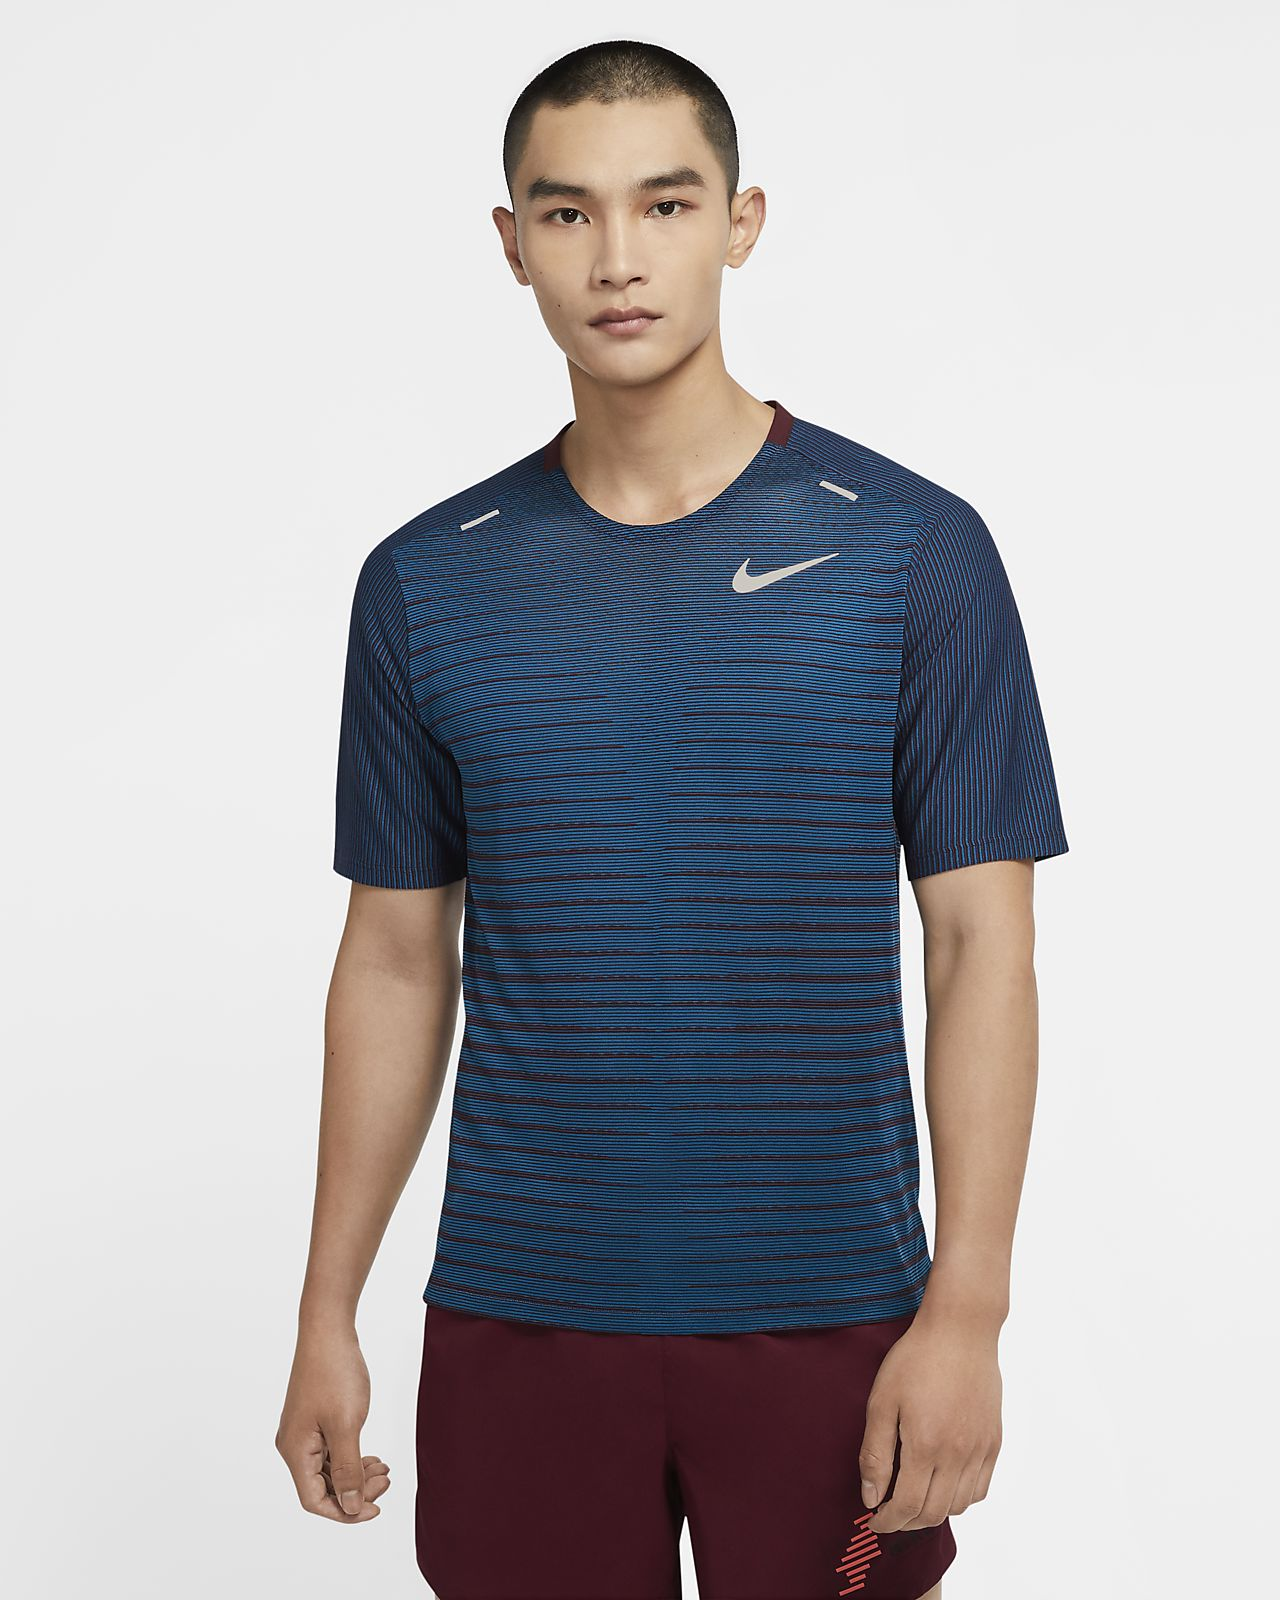 Camiseta de running para hombre Nike Techknit Future Fast